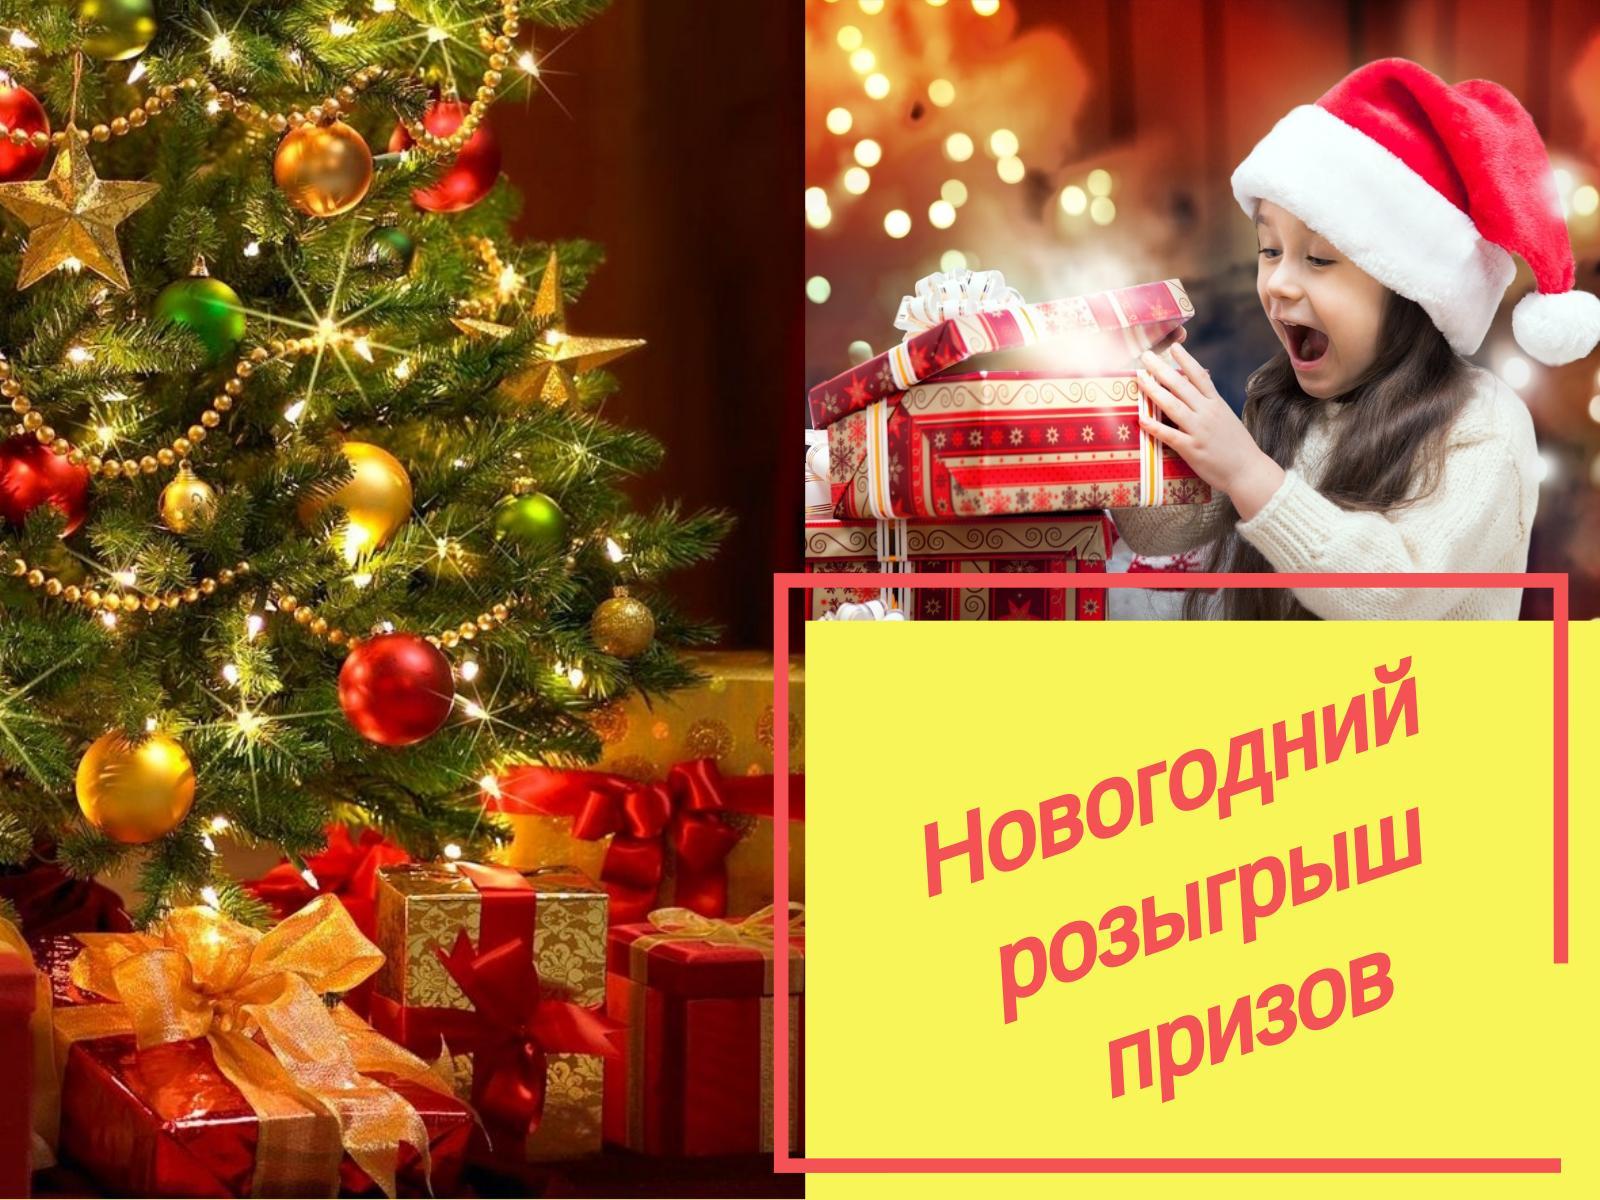 новогодний розыгрыш постер